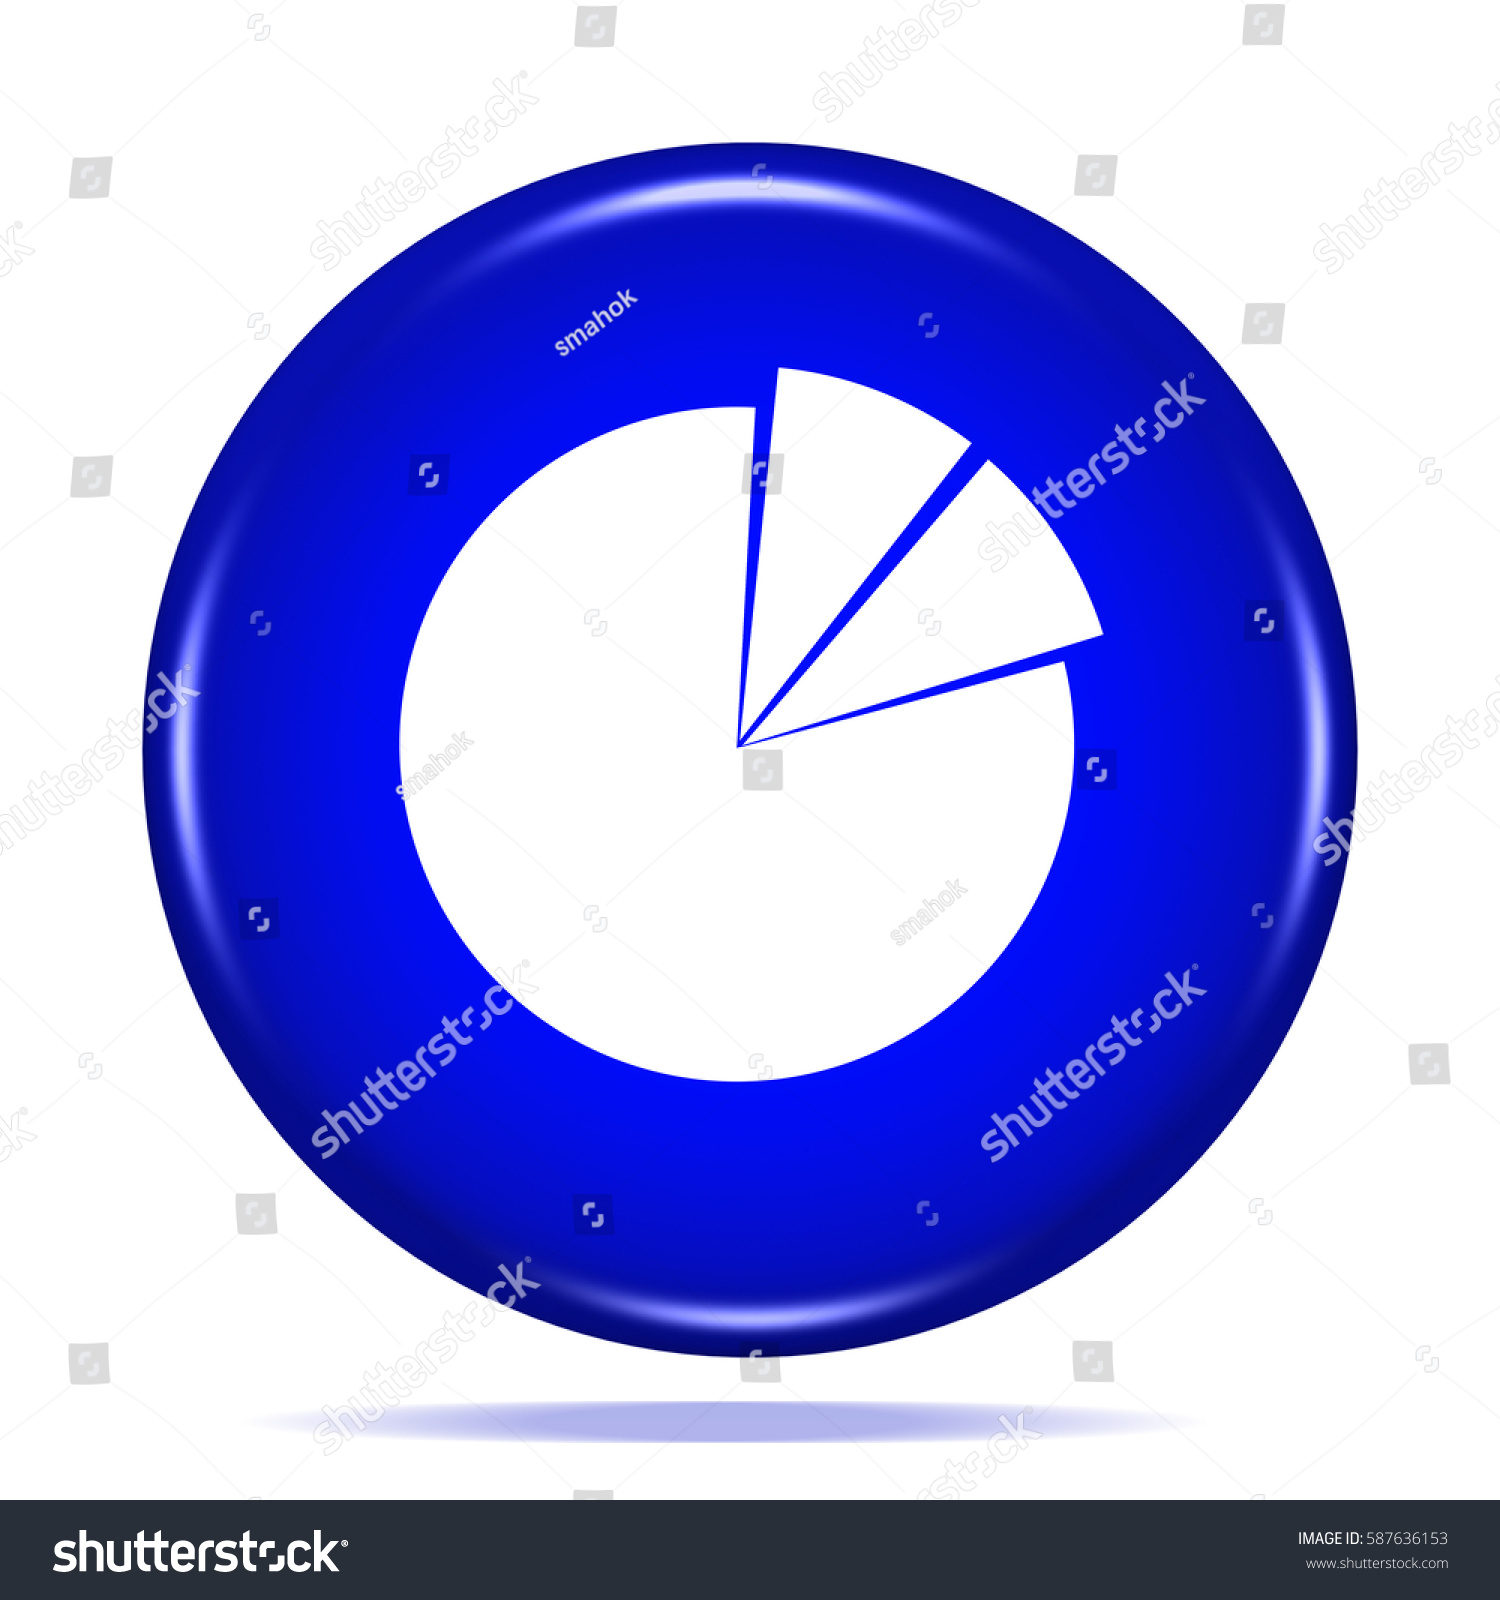 Business Pie Chart Icon Internet Button 3 D Stock Illustration